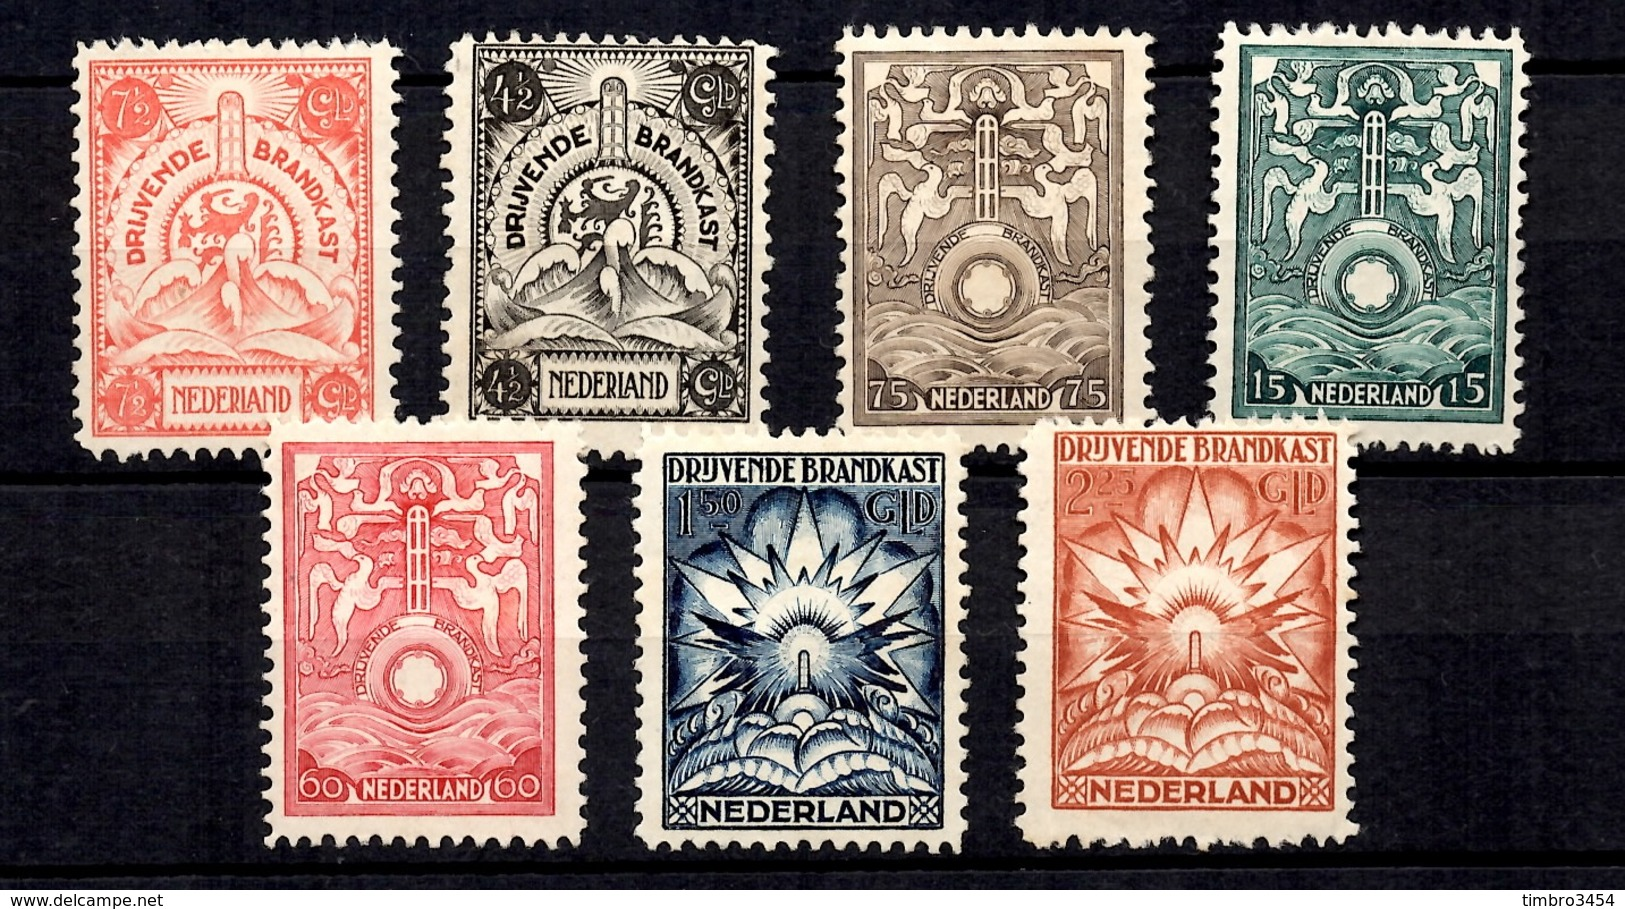 Pays-Bas Série Coffres-forts Flottants De 1921 YT N° 1/7 Neufs (*). Bonne Série. B/TB. A Saisir! - Period 1891-1948 (Wilhelmina)